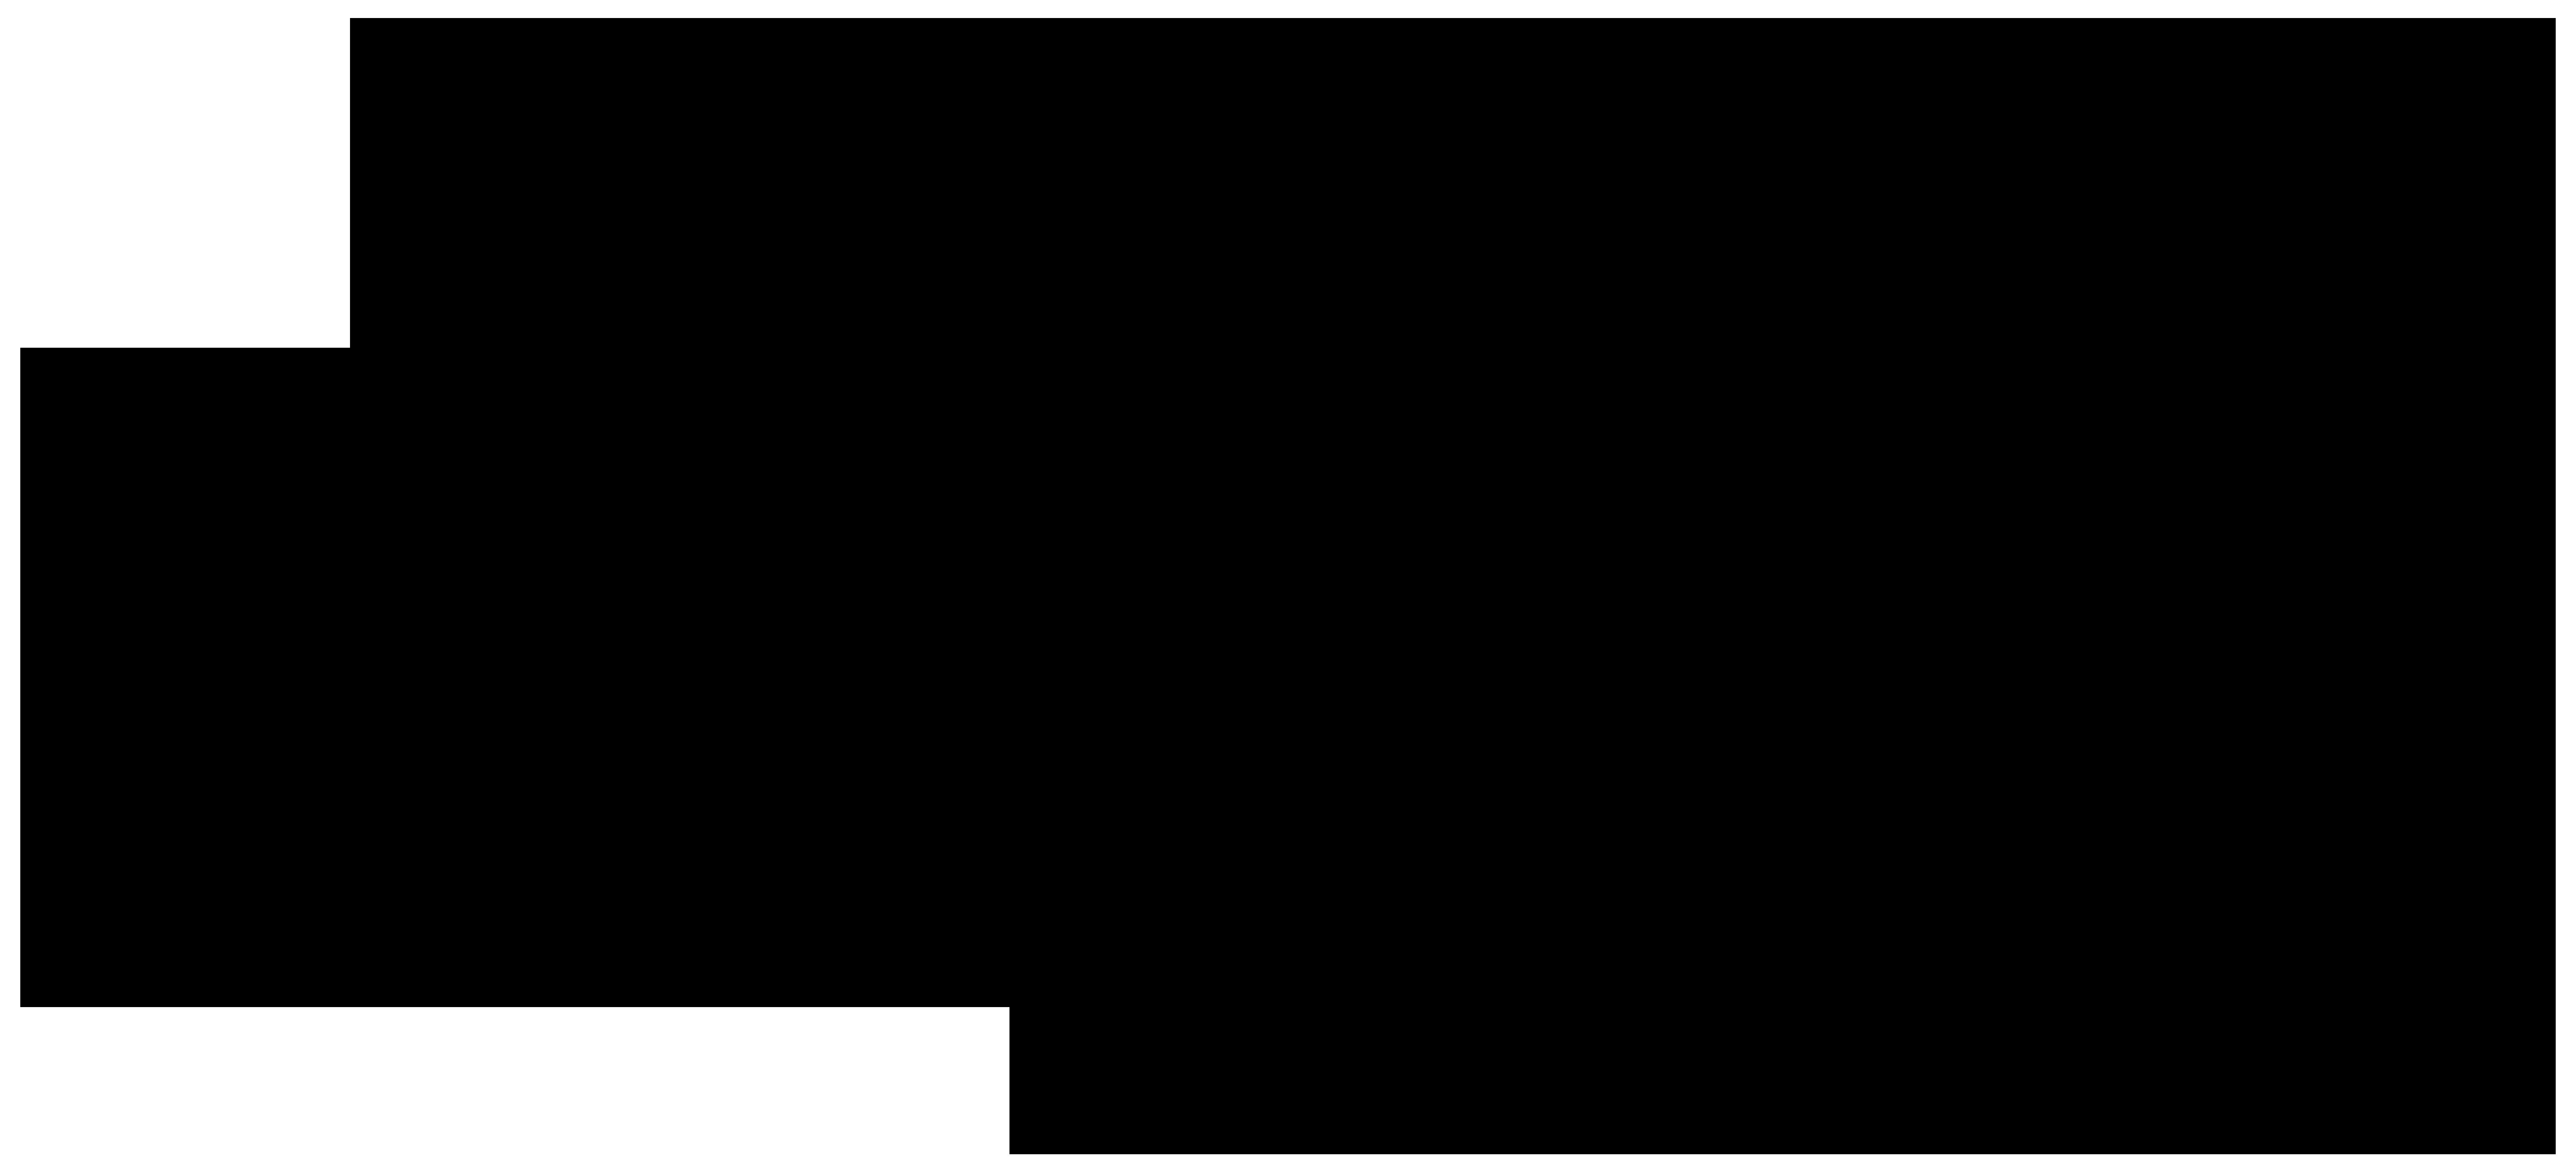 Rhinoceros cattle silhouette clip. Flour clipart pack